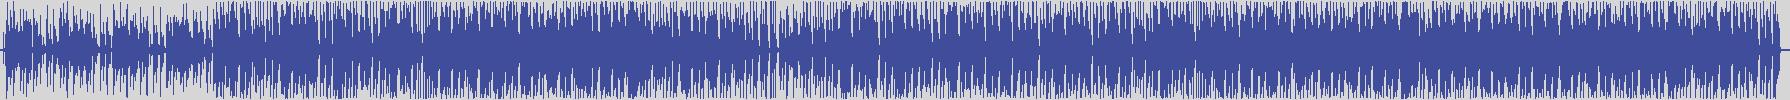 gold_hit_records [GHR003] Lucas Castro - Si Me Preguntan Por Ti [Radio Edit] audio wave form